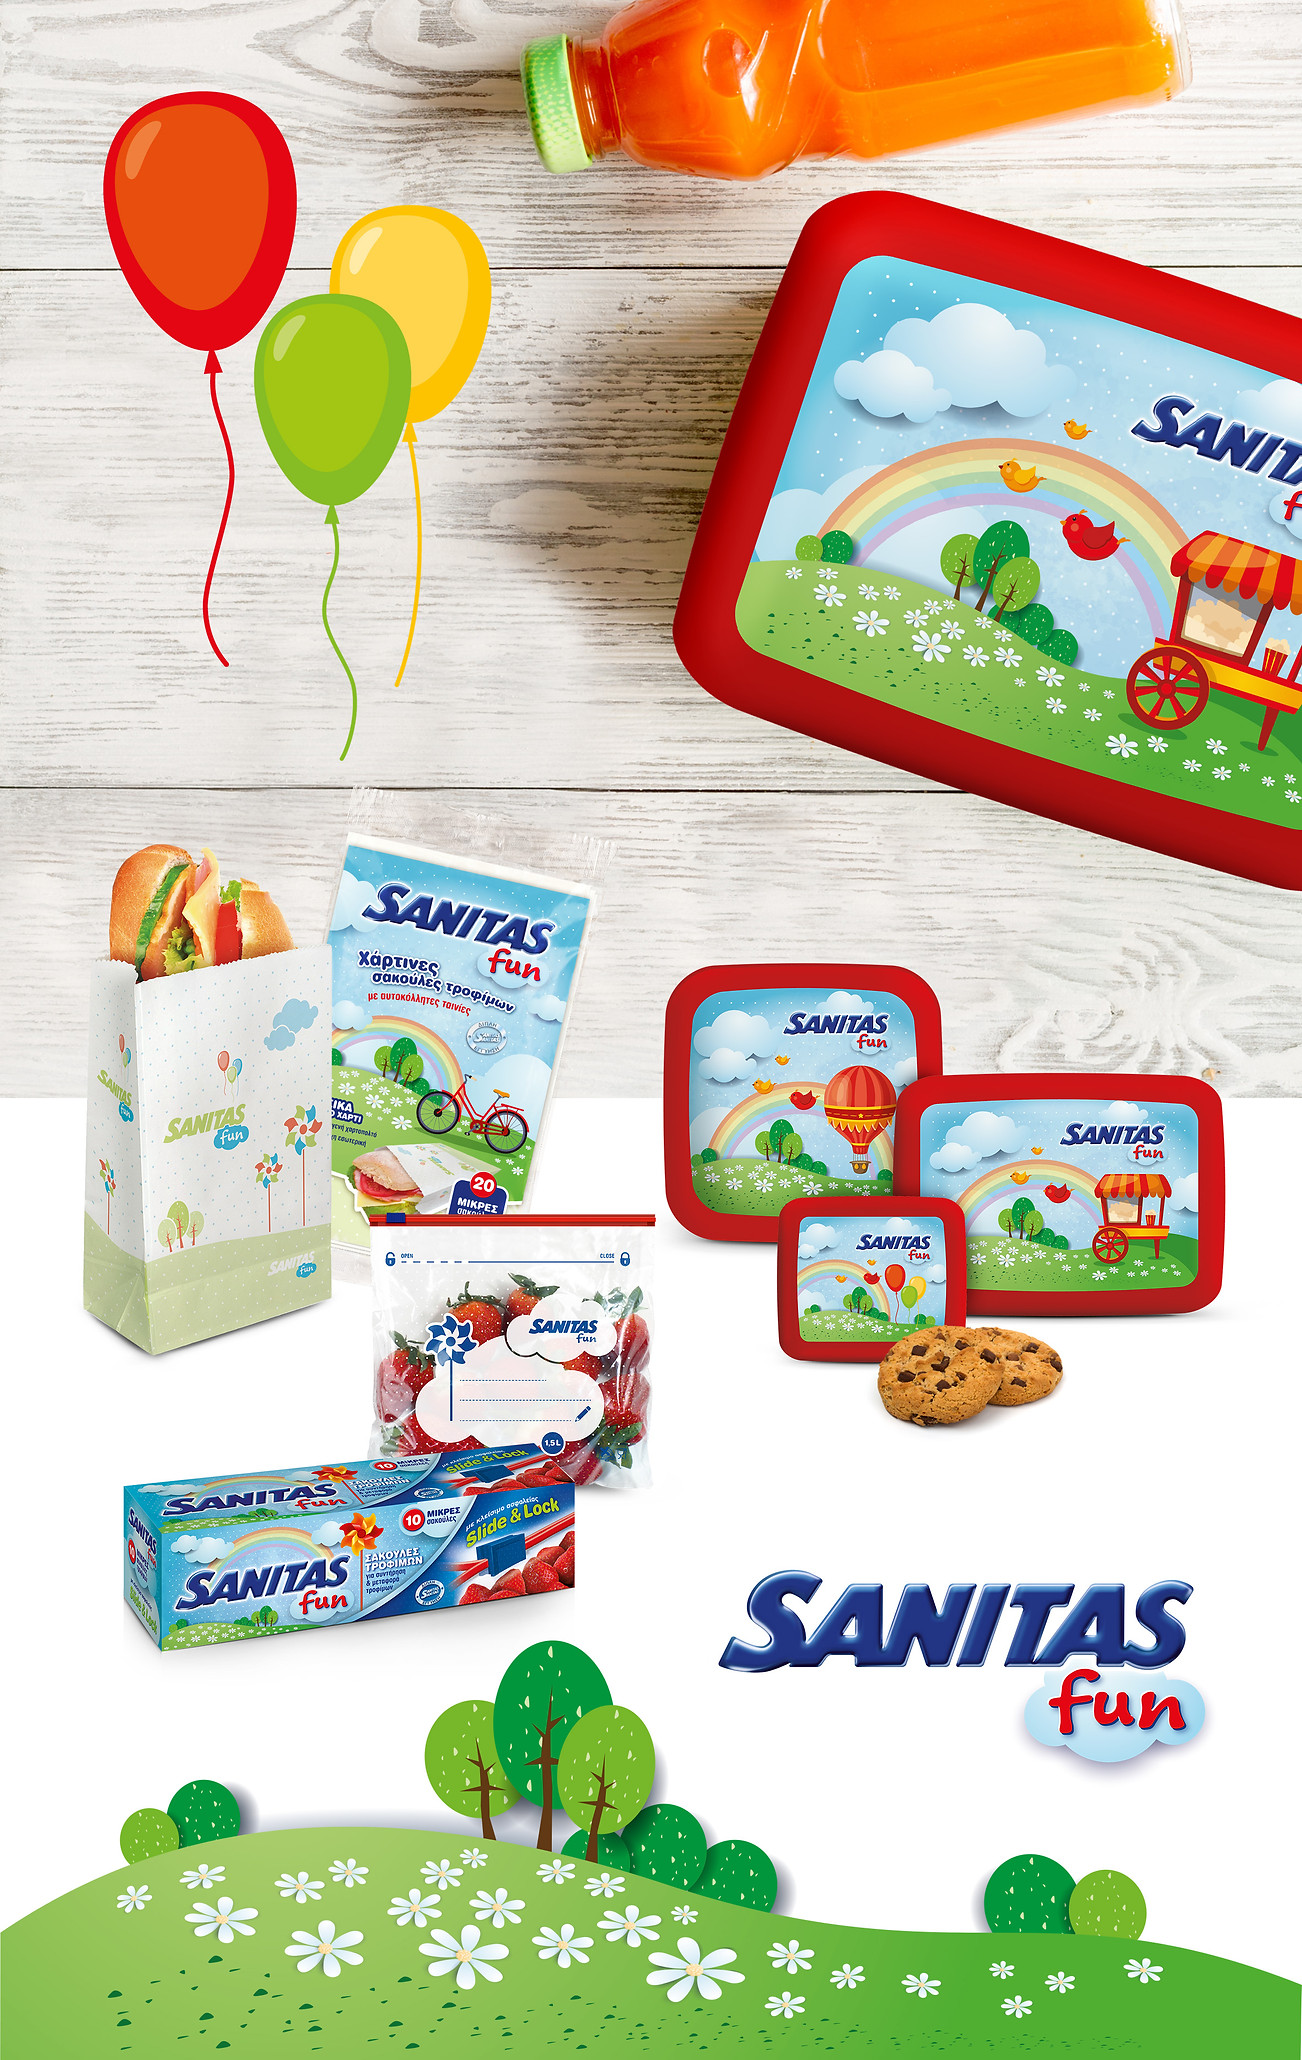 Sanitas packaging